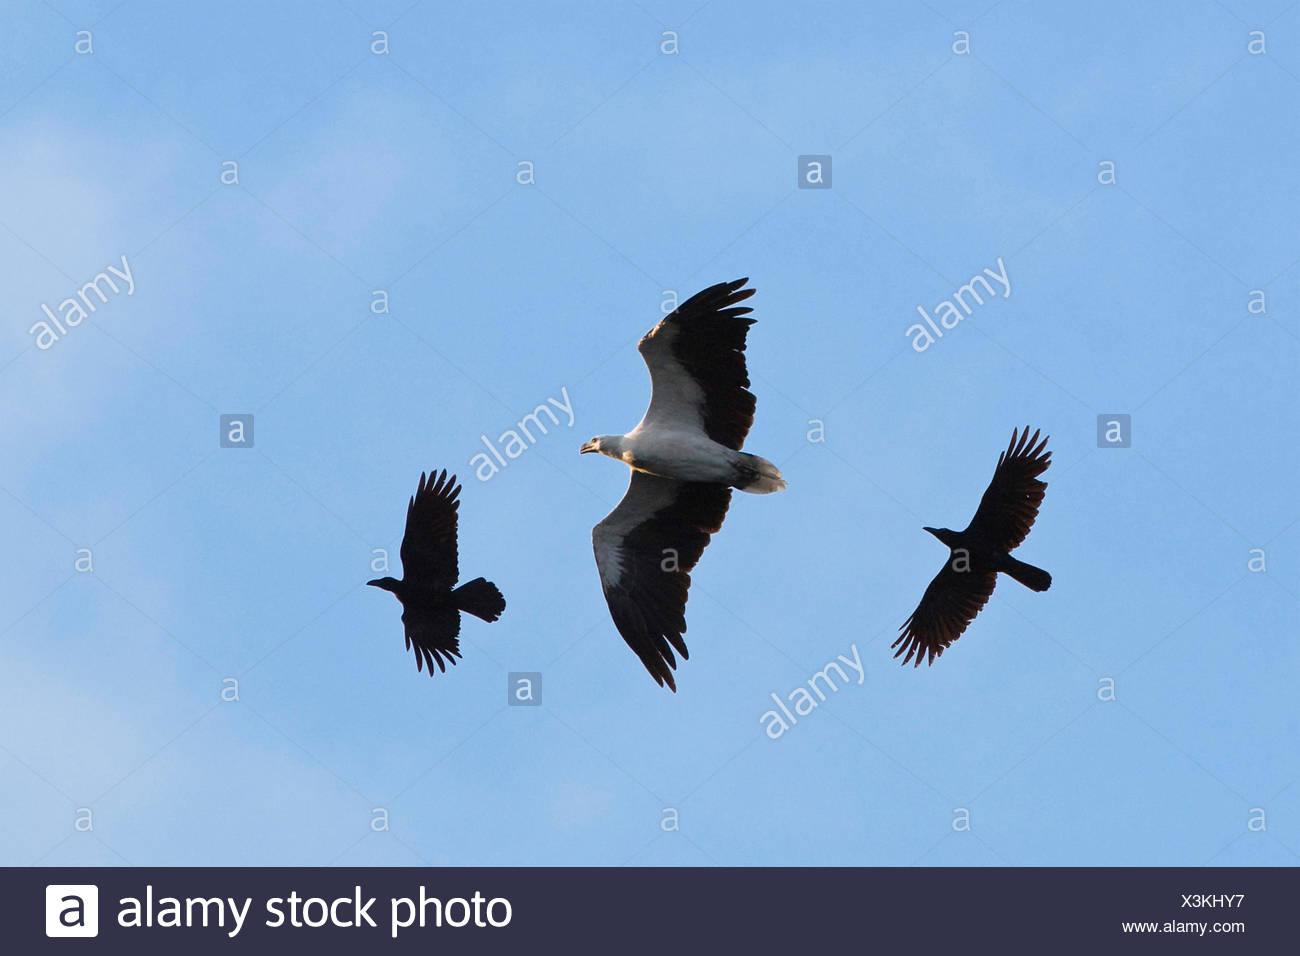 Dschungel Krähe (Corvus Macrorhynchos), Dschungel Krähen angreifen White-bellied Sea-Eagle, Haliaeetus Leucogaster, Indien, Andaman Inseln Stockbild